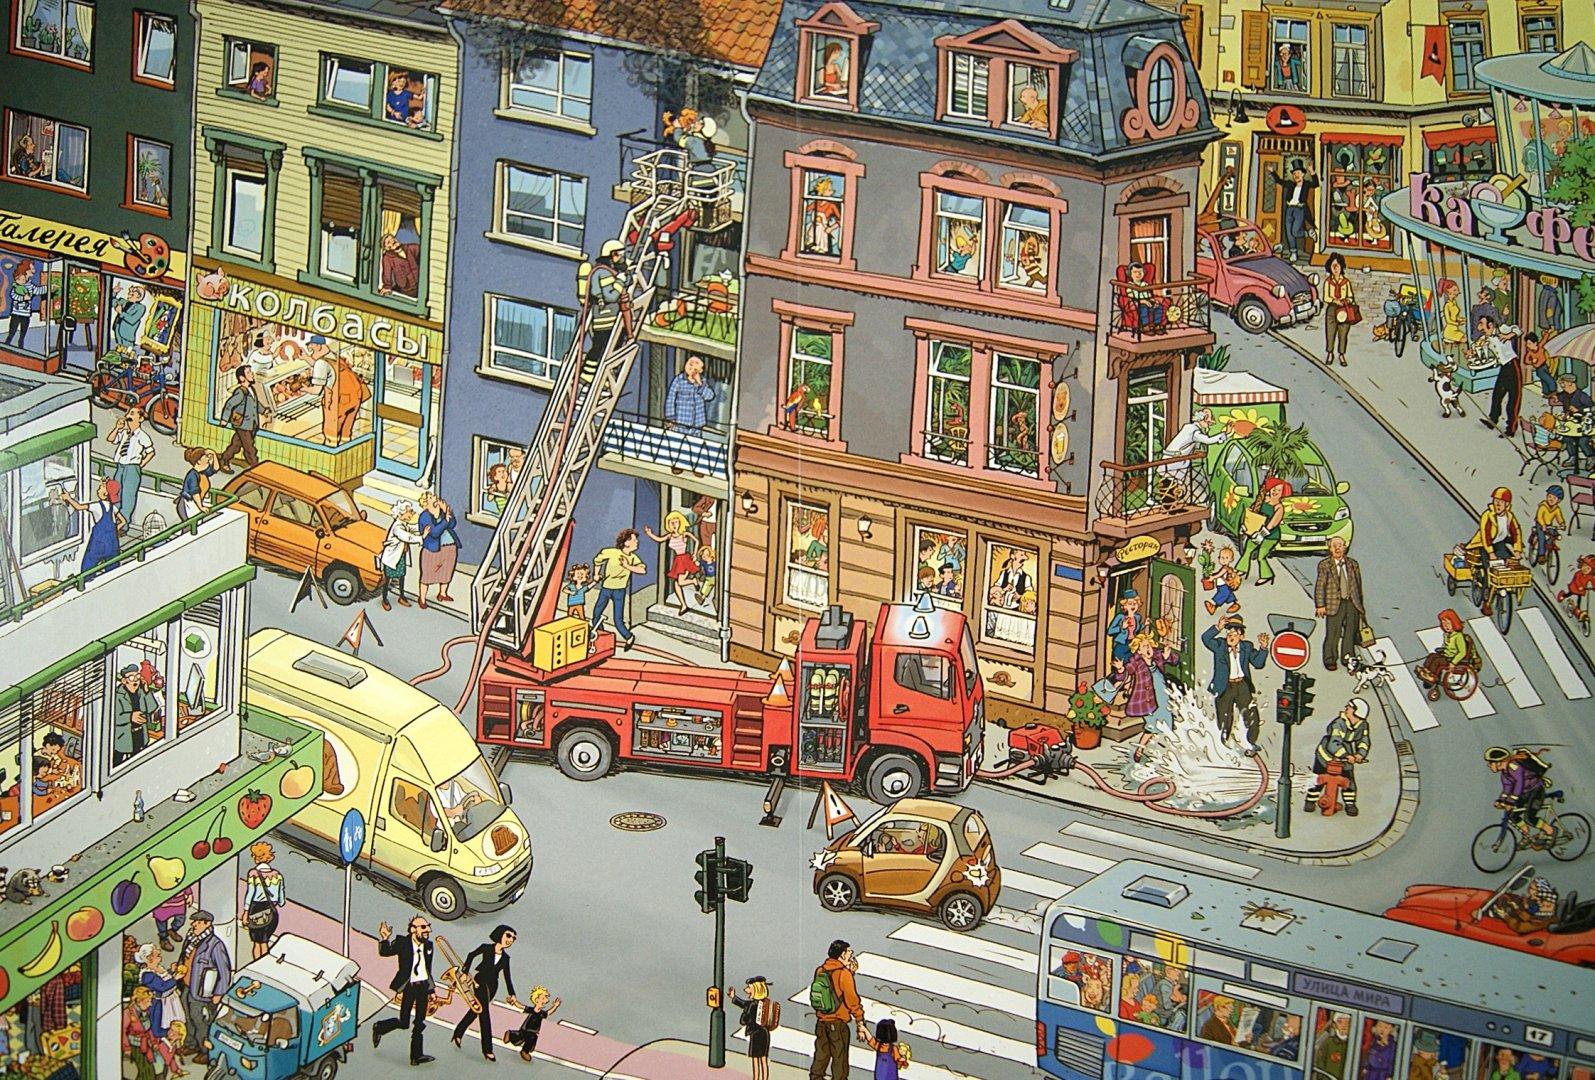 улица из книг картинки